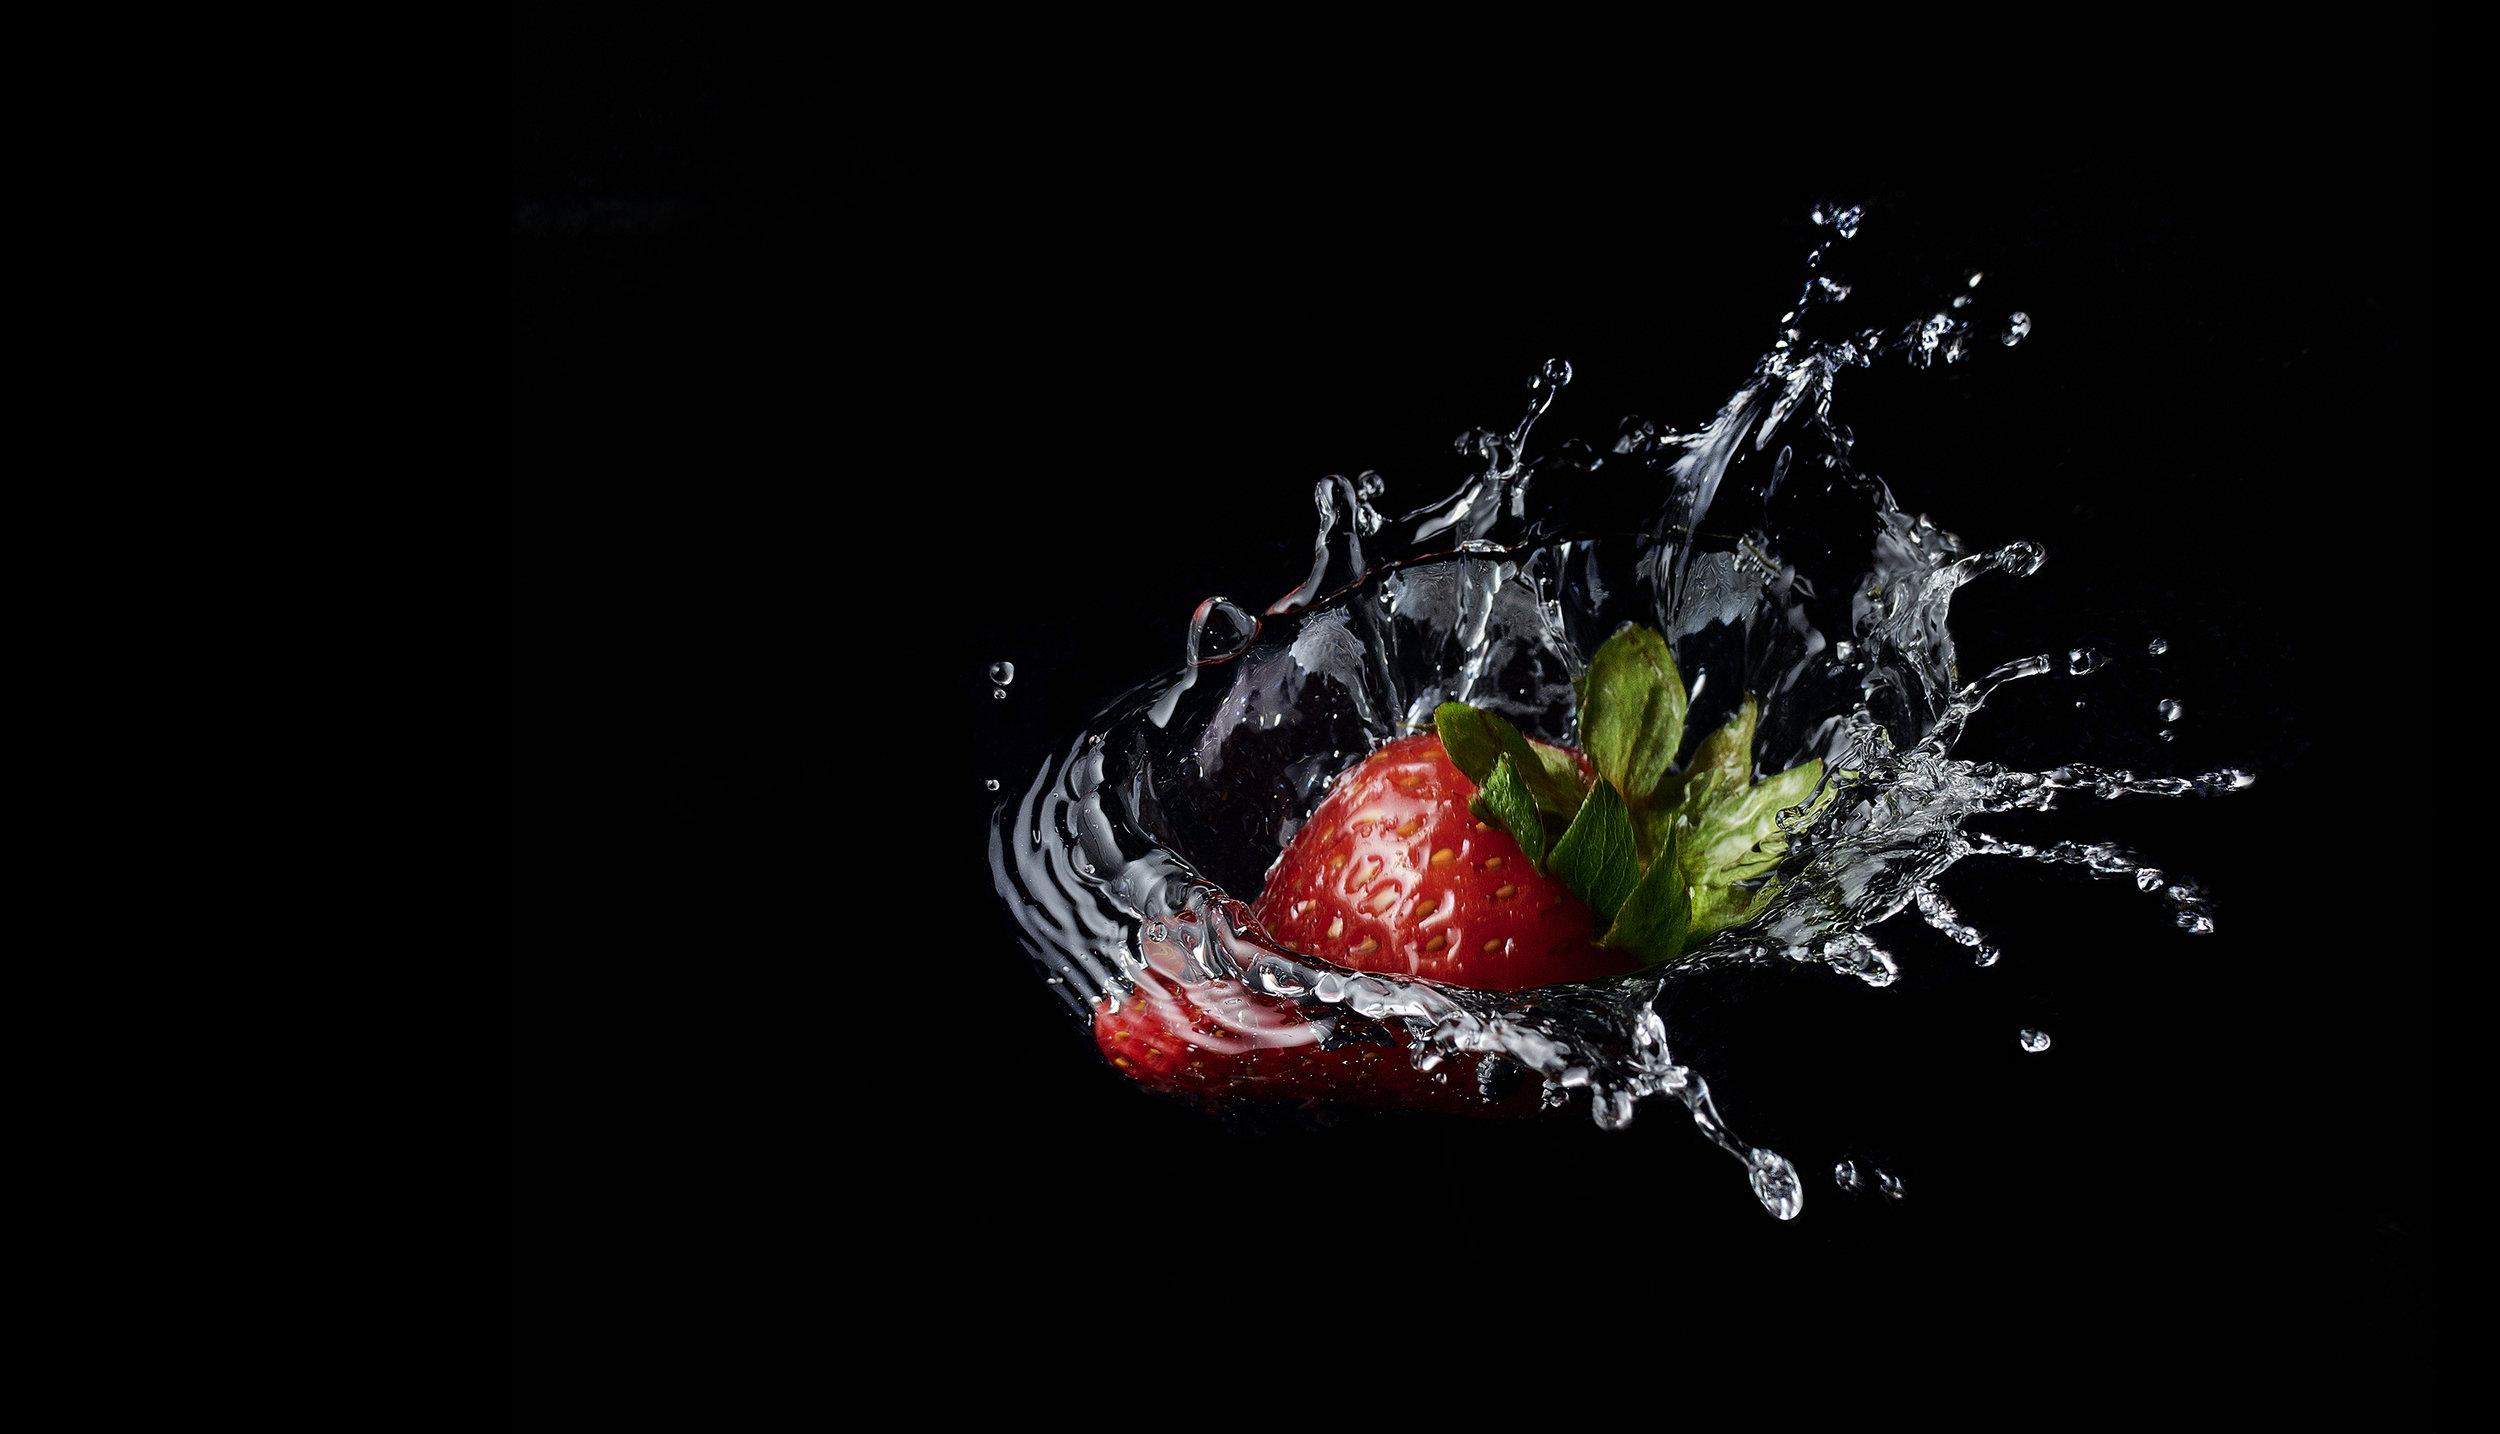 Strawberry Splash, Foodfotograf Zürich Schweiz